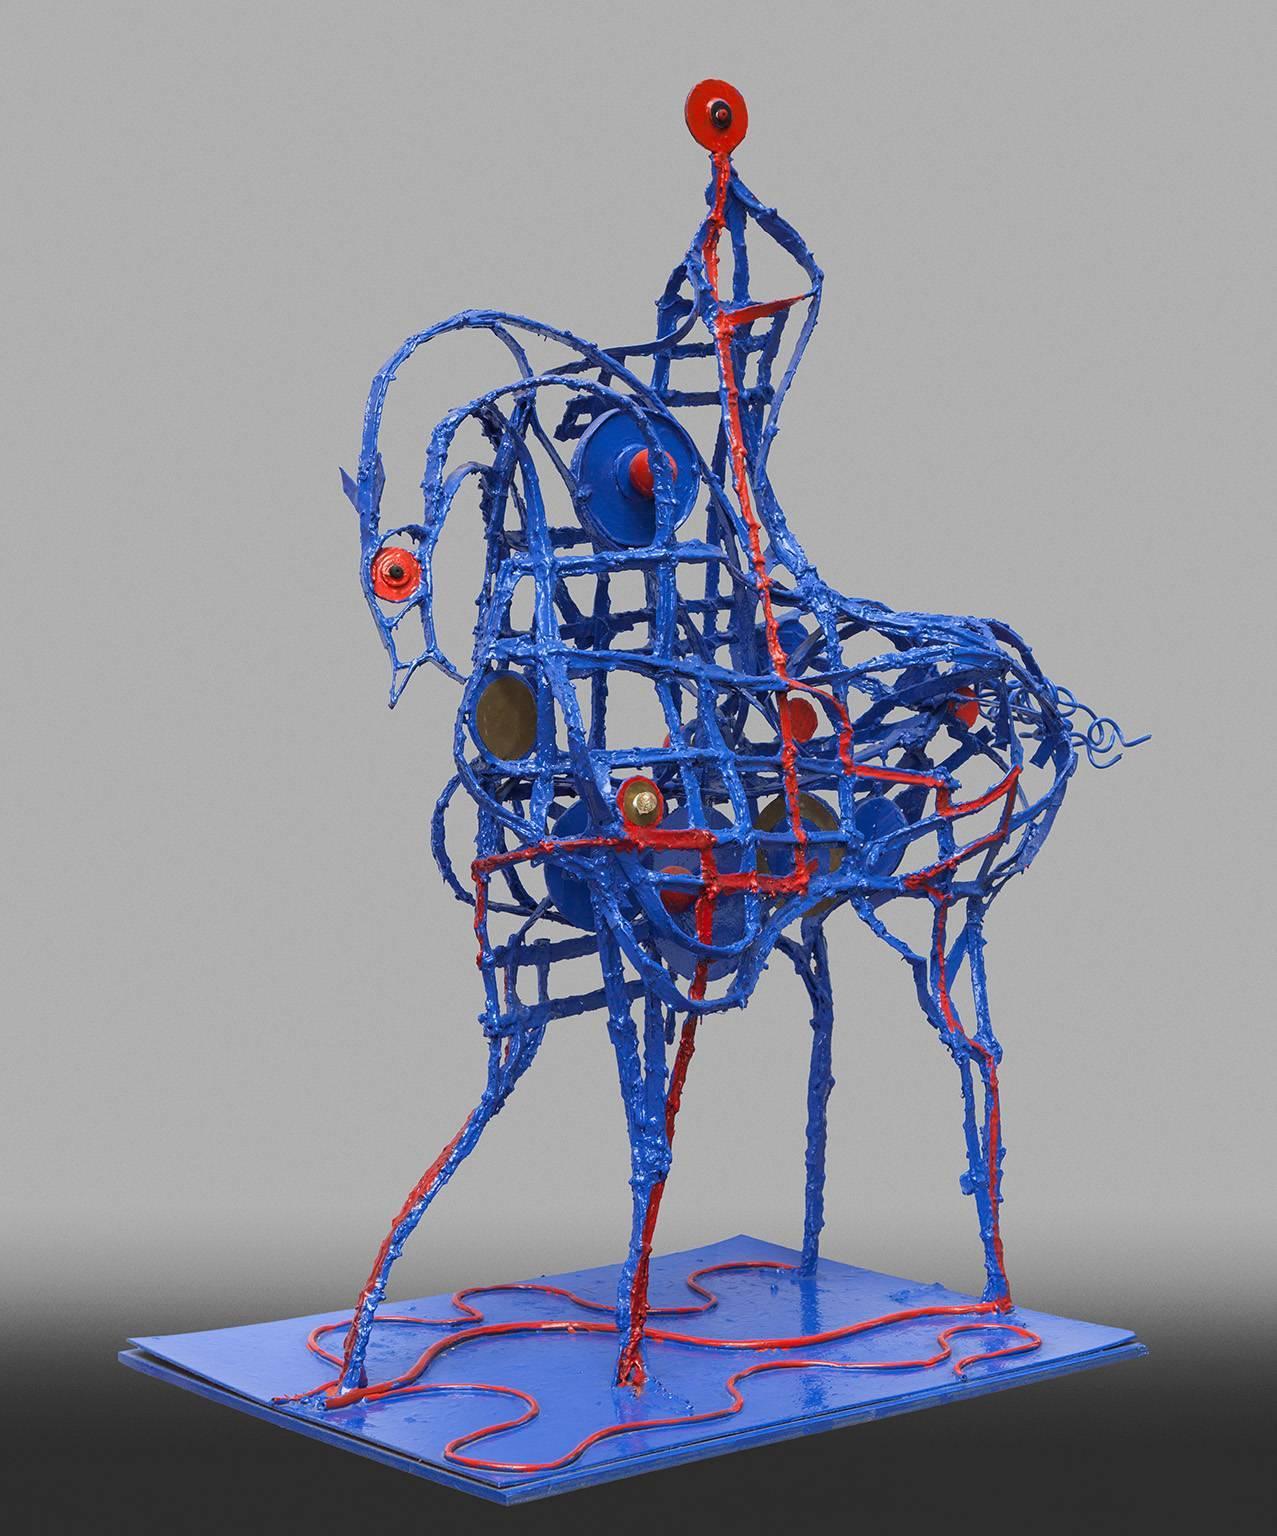 Don Quixote - Resin and Metal Blue Sculpture